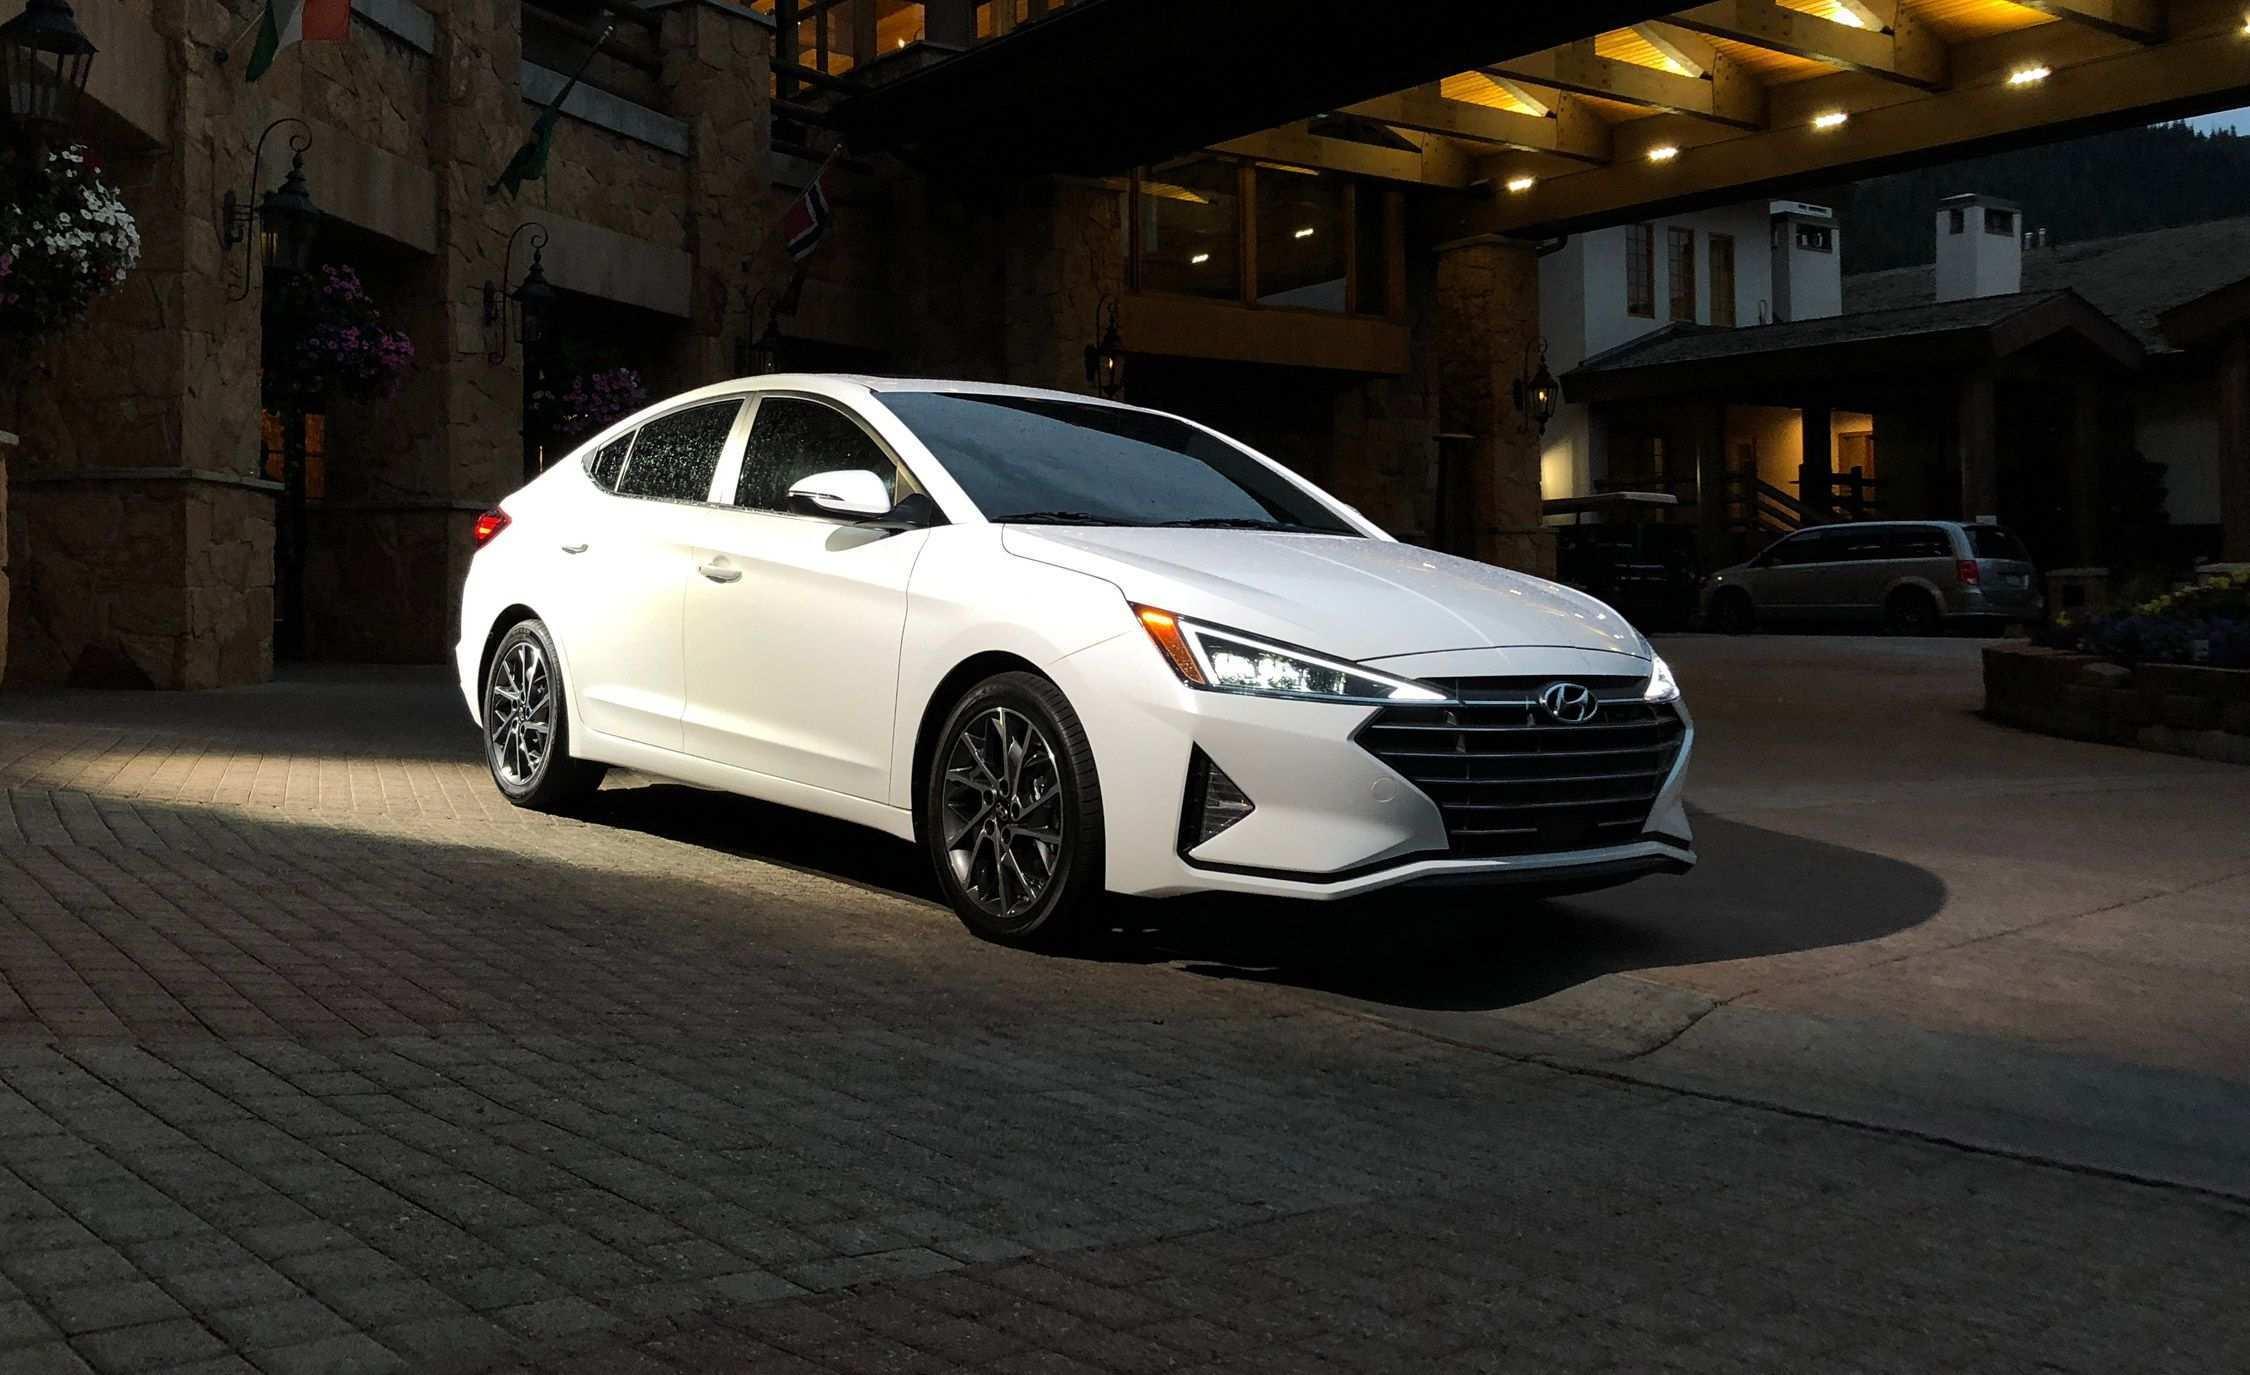 41 New 2019 Hyundai Elantra Sport Release Date by 2019 Hyundai Elantra Sport